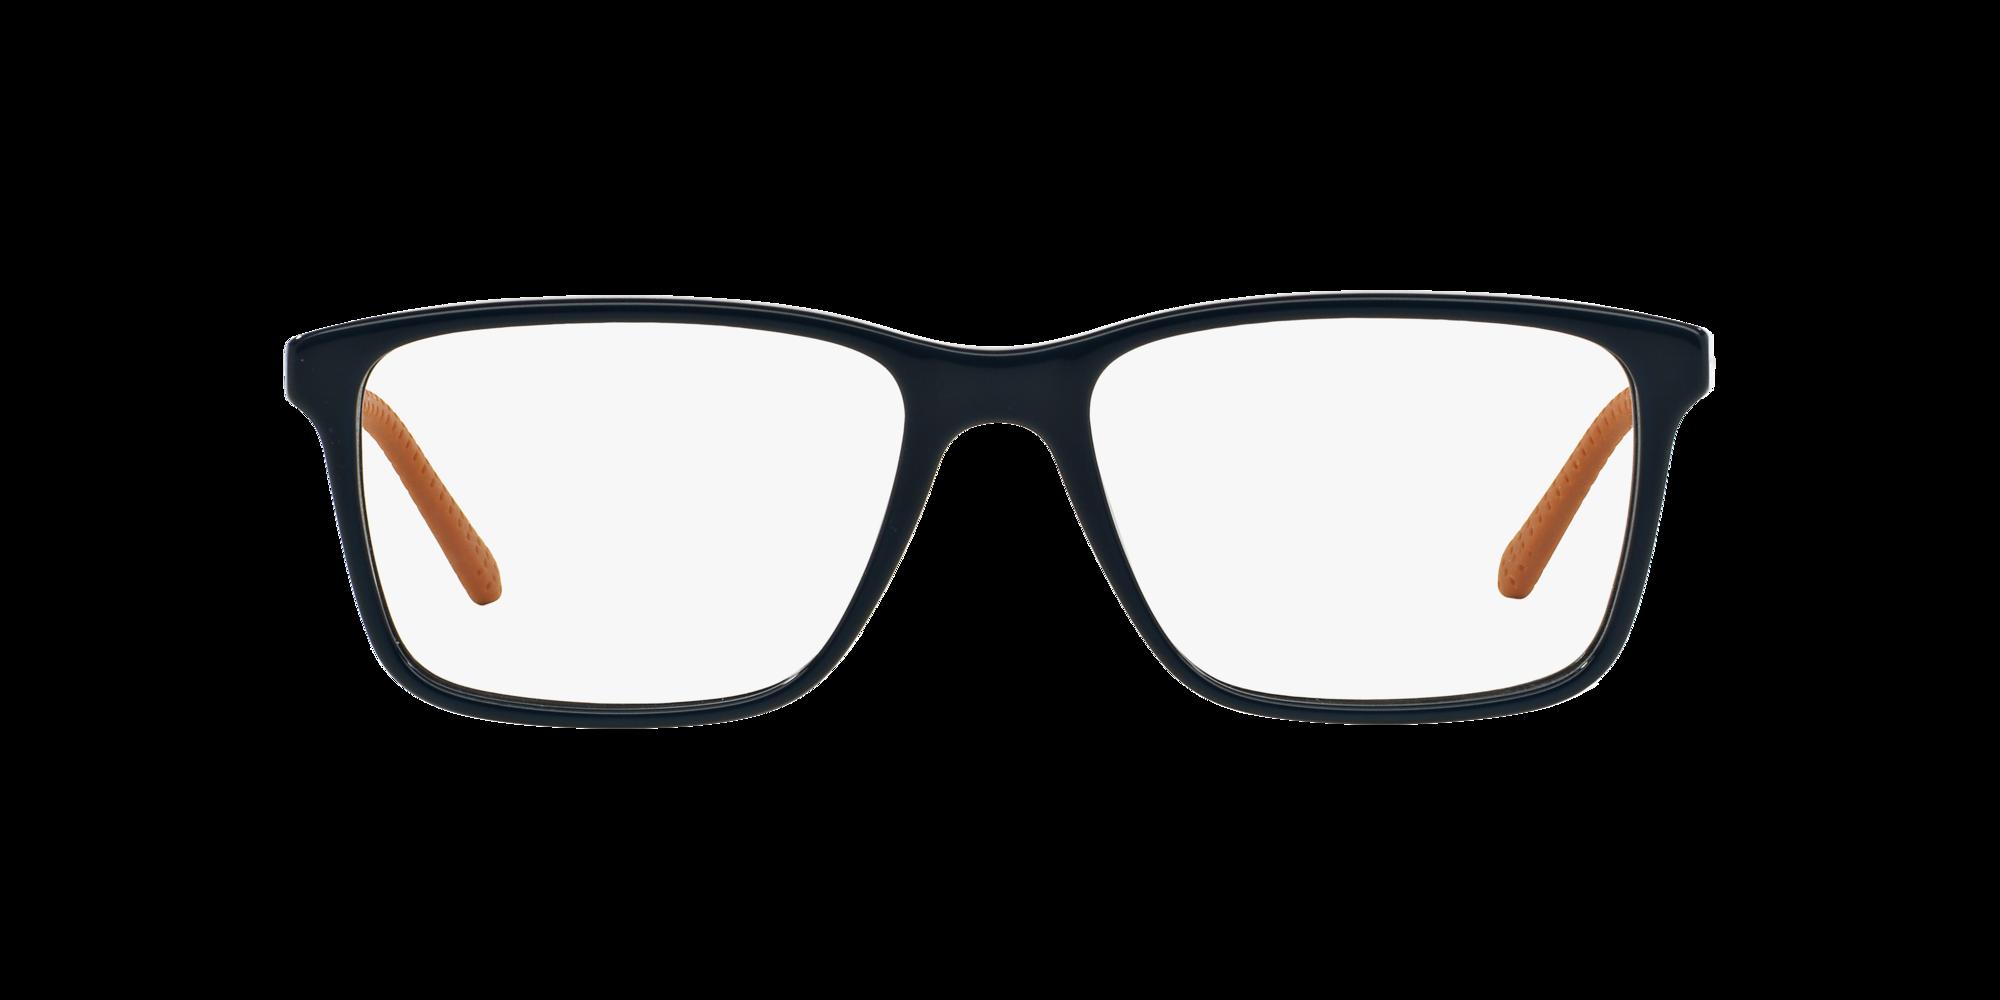 Image for RL6133 from LensCrafters | Glasses, Prescription Glasses Online, Eyewear